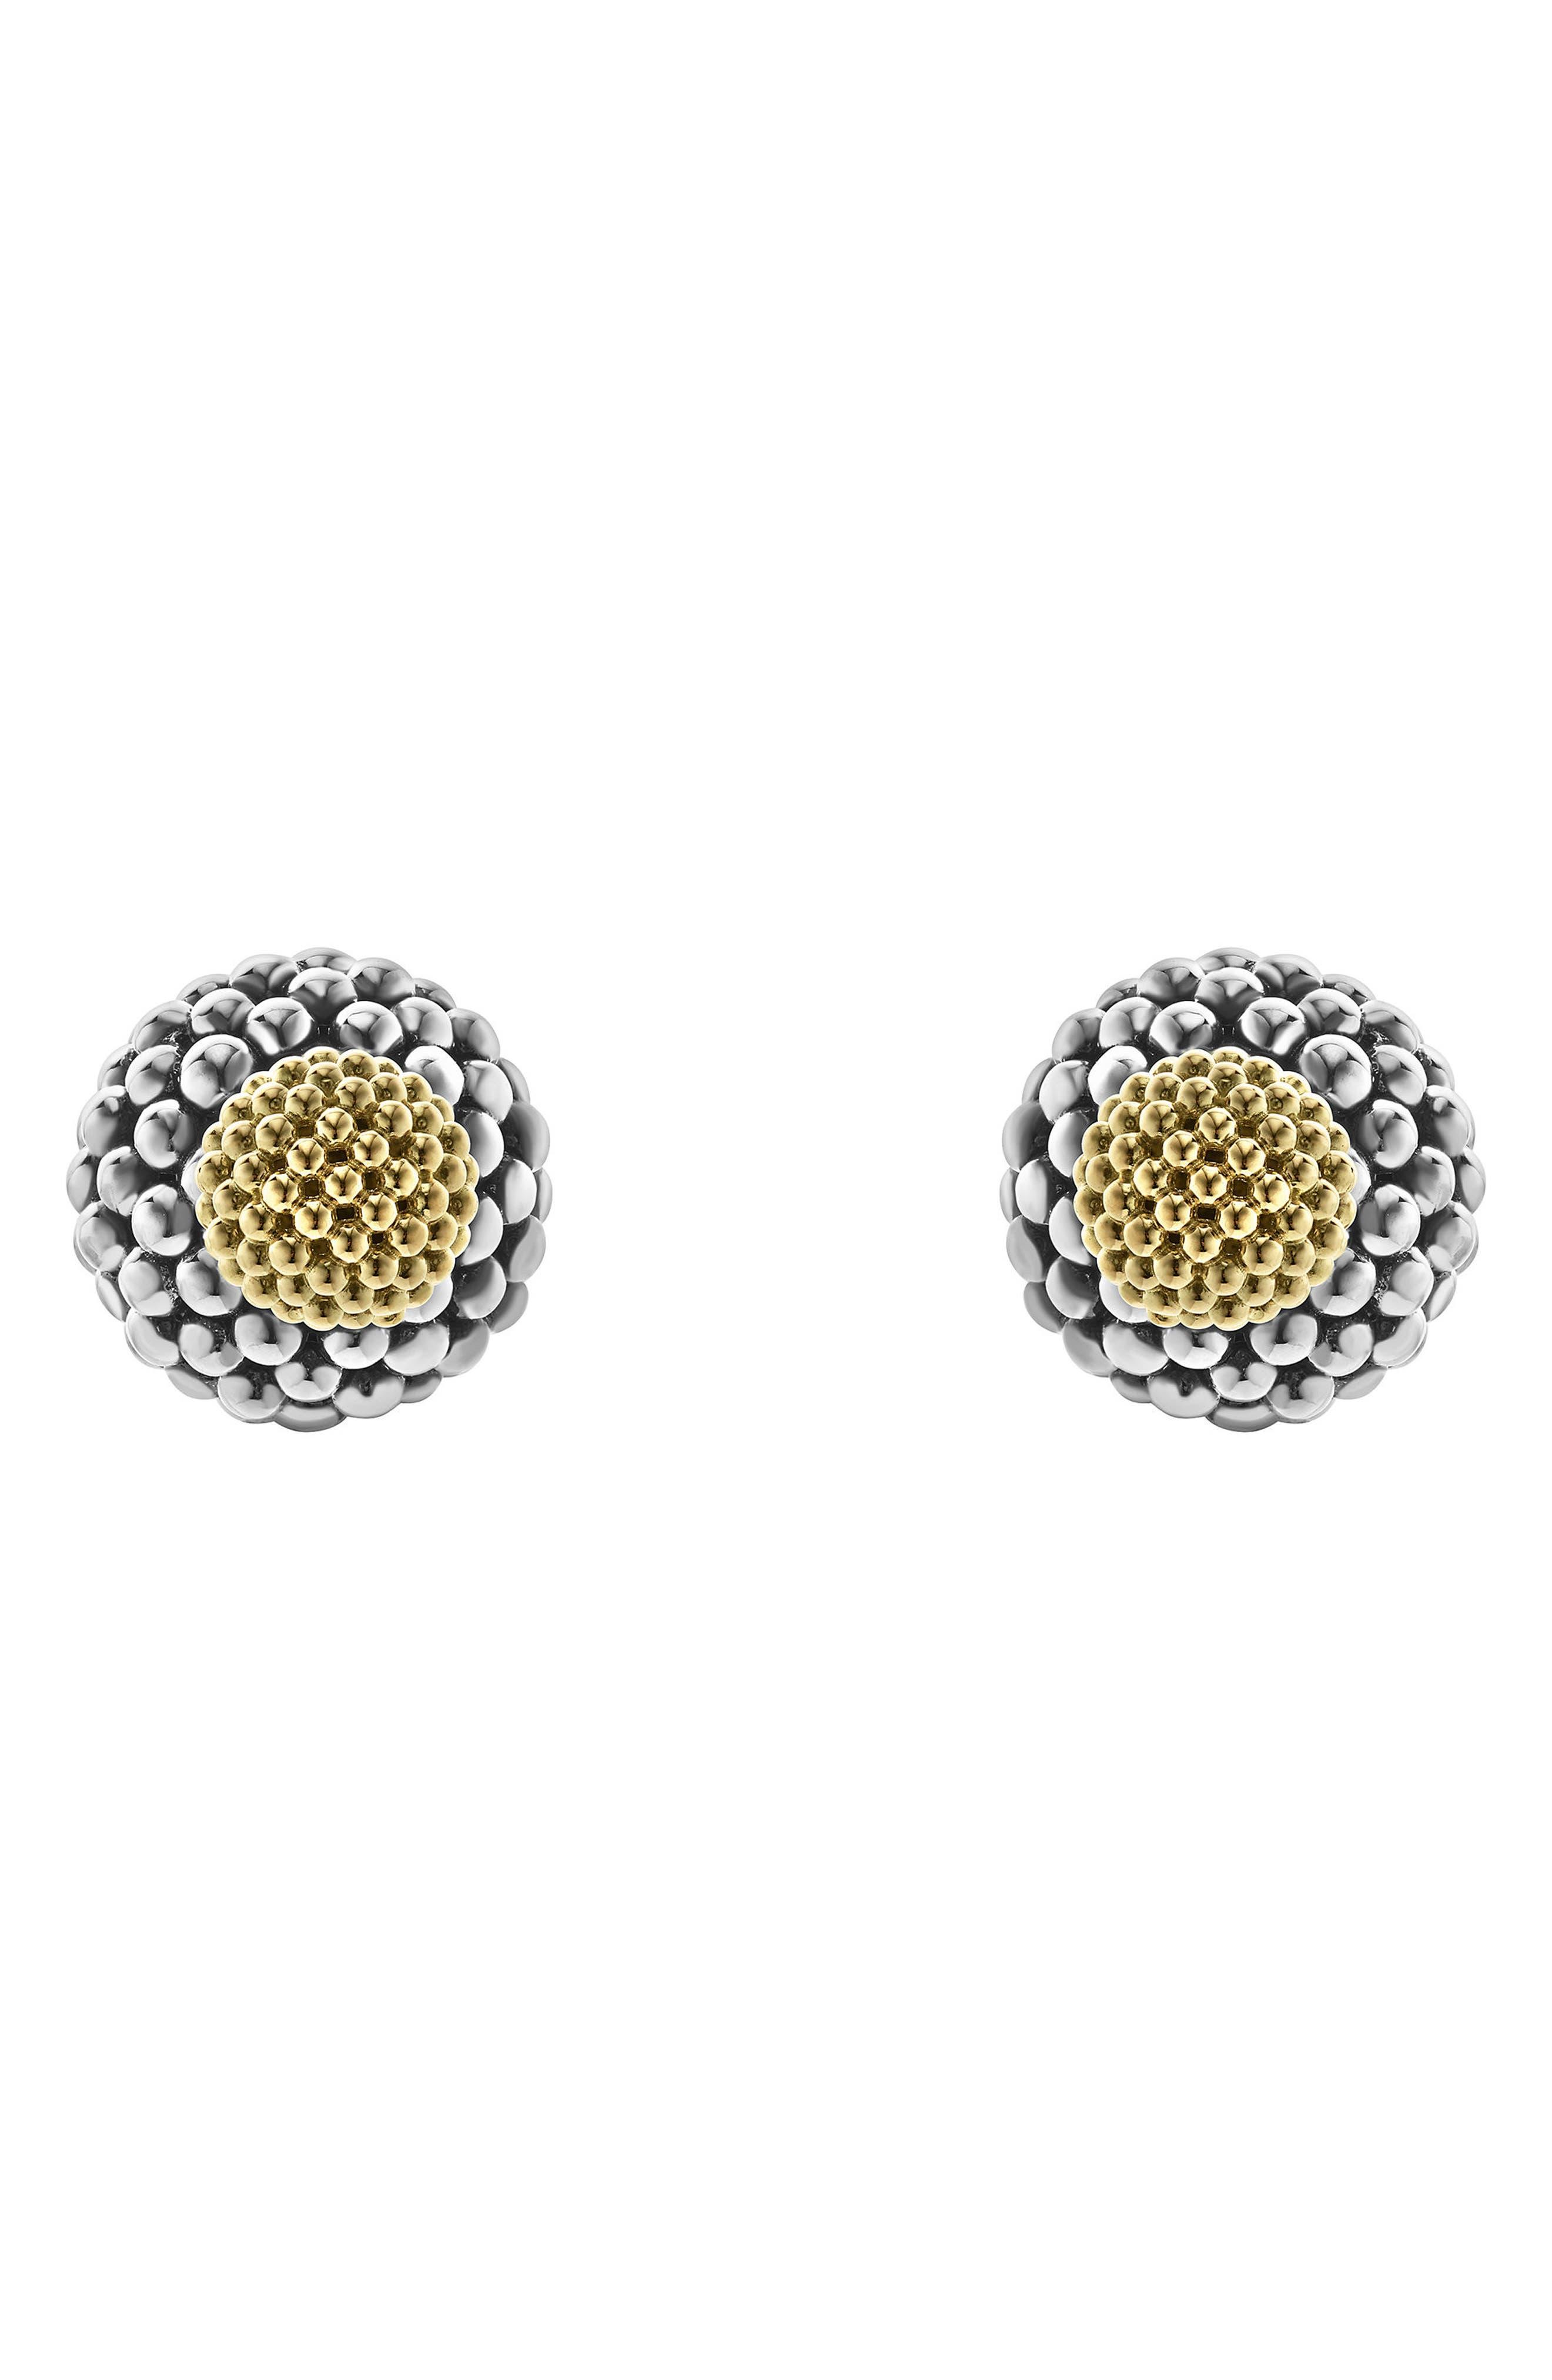 Caviar Ball Stud Earrings,                         Main,                         color, Silver/ Gold